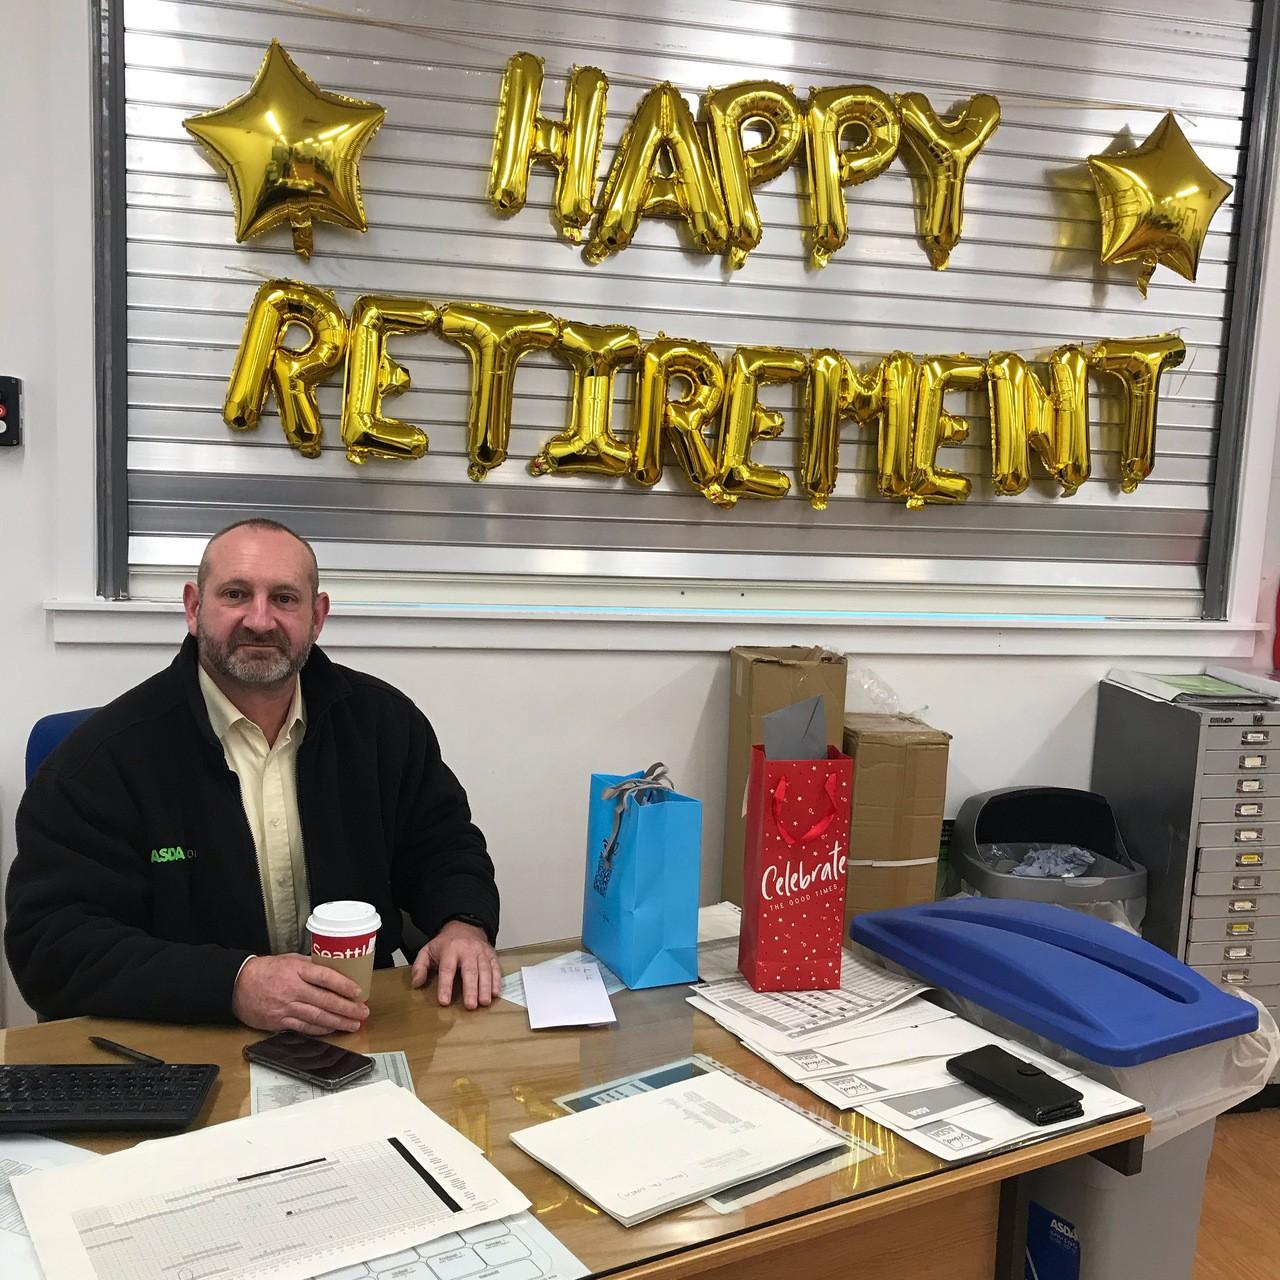 End of an era for retiring Ayr store manager | Asda Ayr